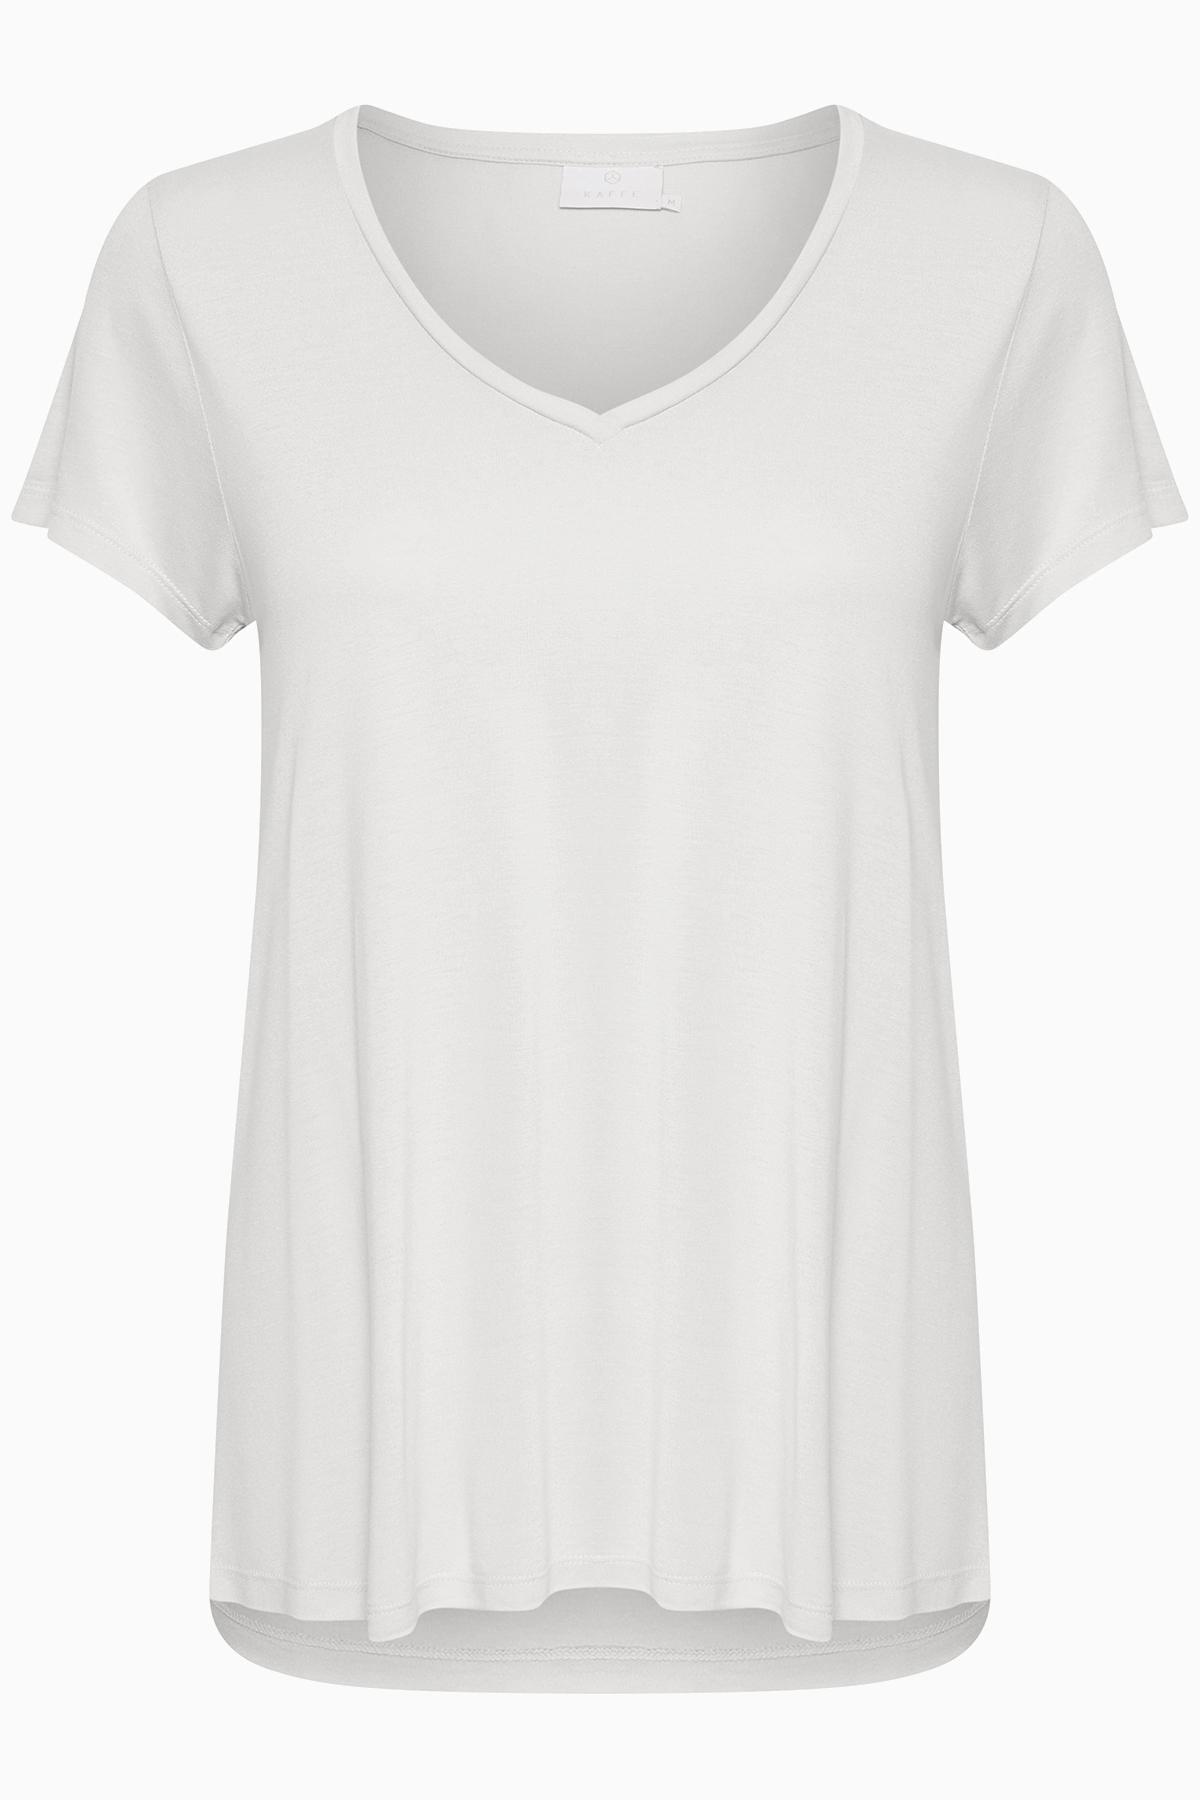 Weiß Kurzarm T-Shirt von Kaffe – Shoppen Sie Weiß Kurzarm T-Shirt ab Gr. XS-XXL hier